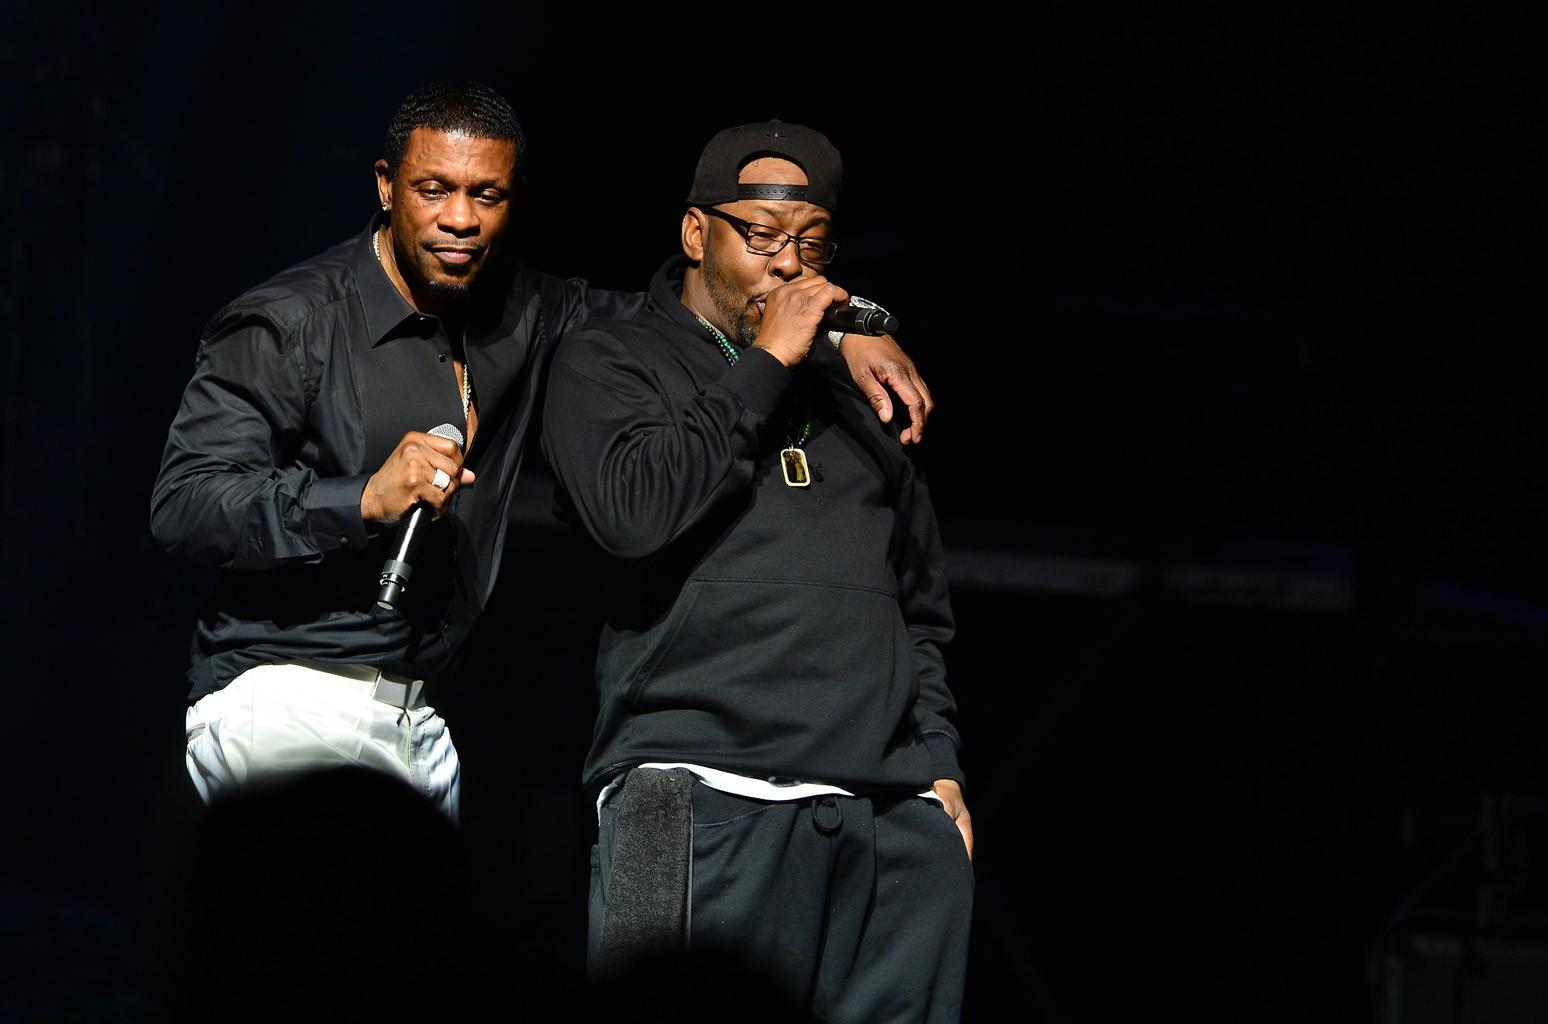 Bobby Brown vs. Keith Sweat in Essence Verzuz Battle of R&B Icons: Billboard's Scorecard & Winner For the Showdown